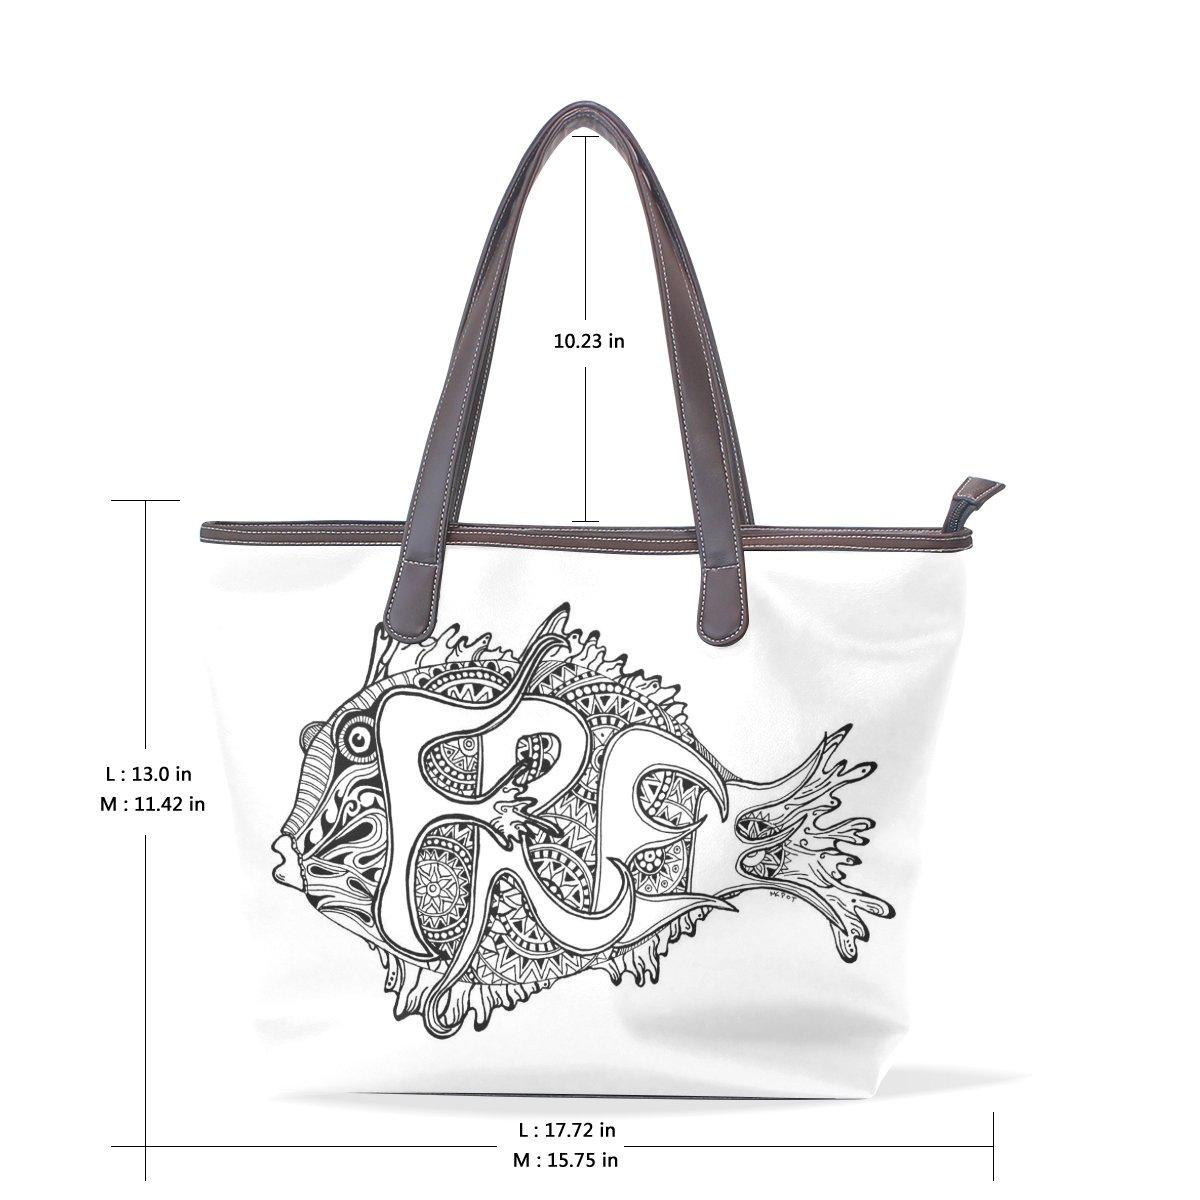 Ye Store Fish Lady PU Leather Handbag Tote Bag Shoulder Bag Shopping Bag